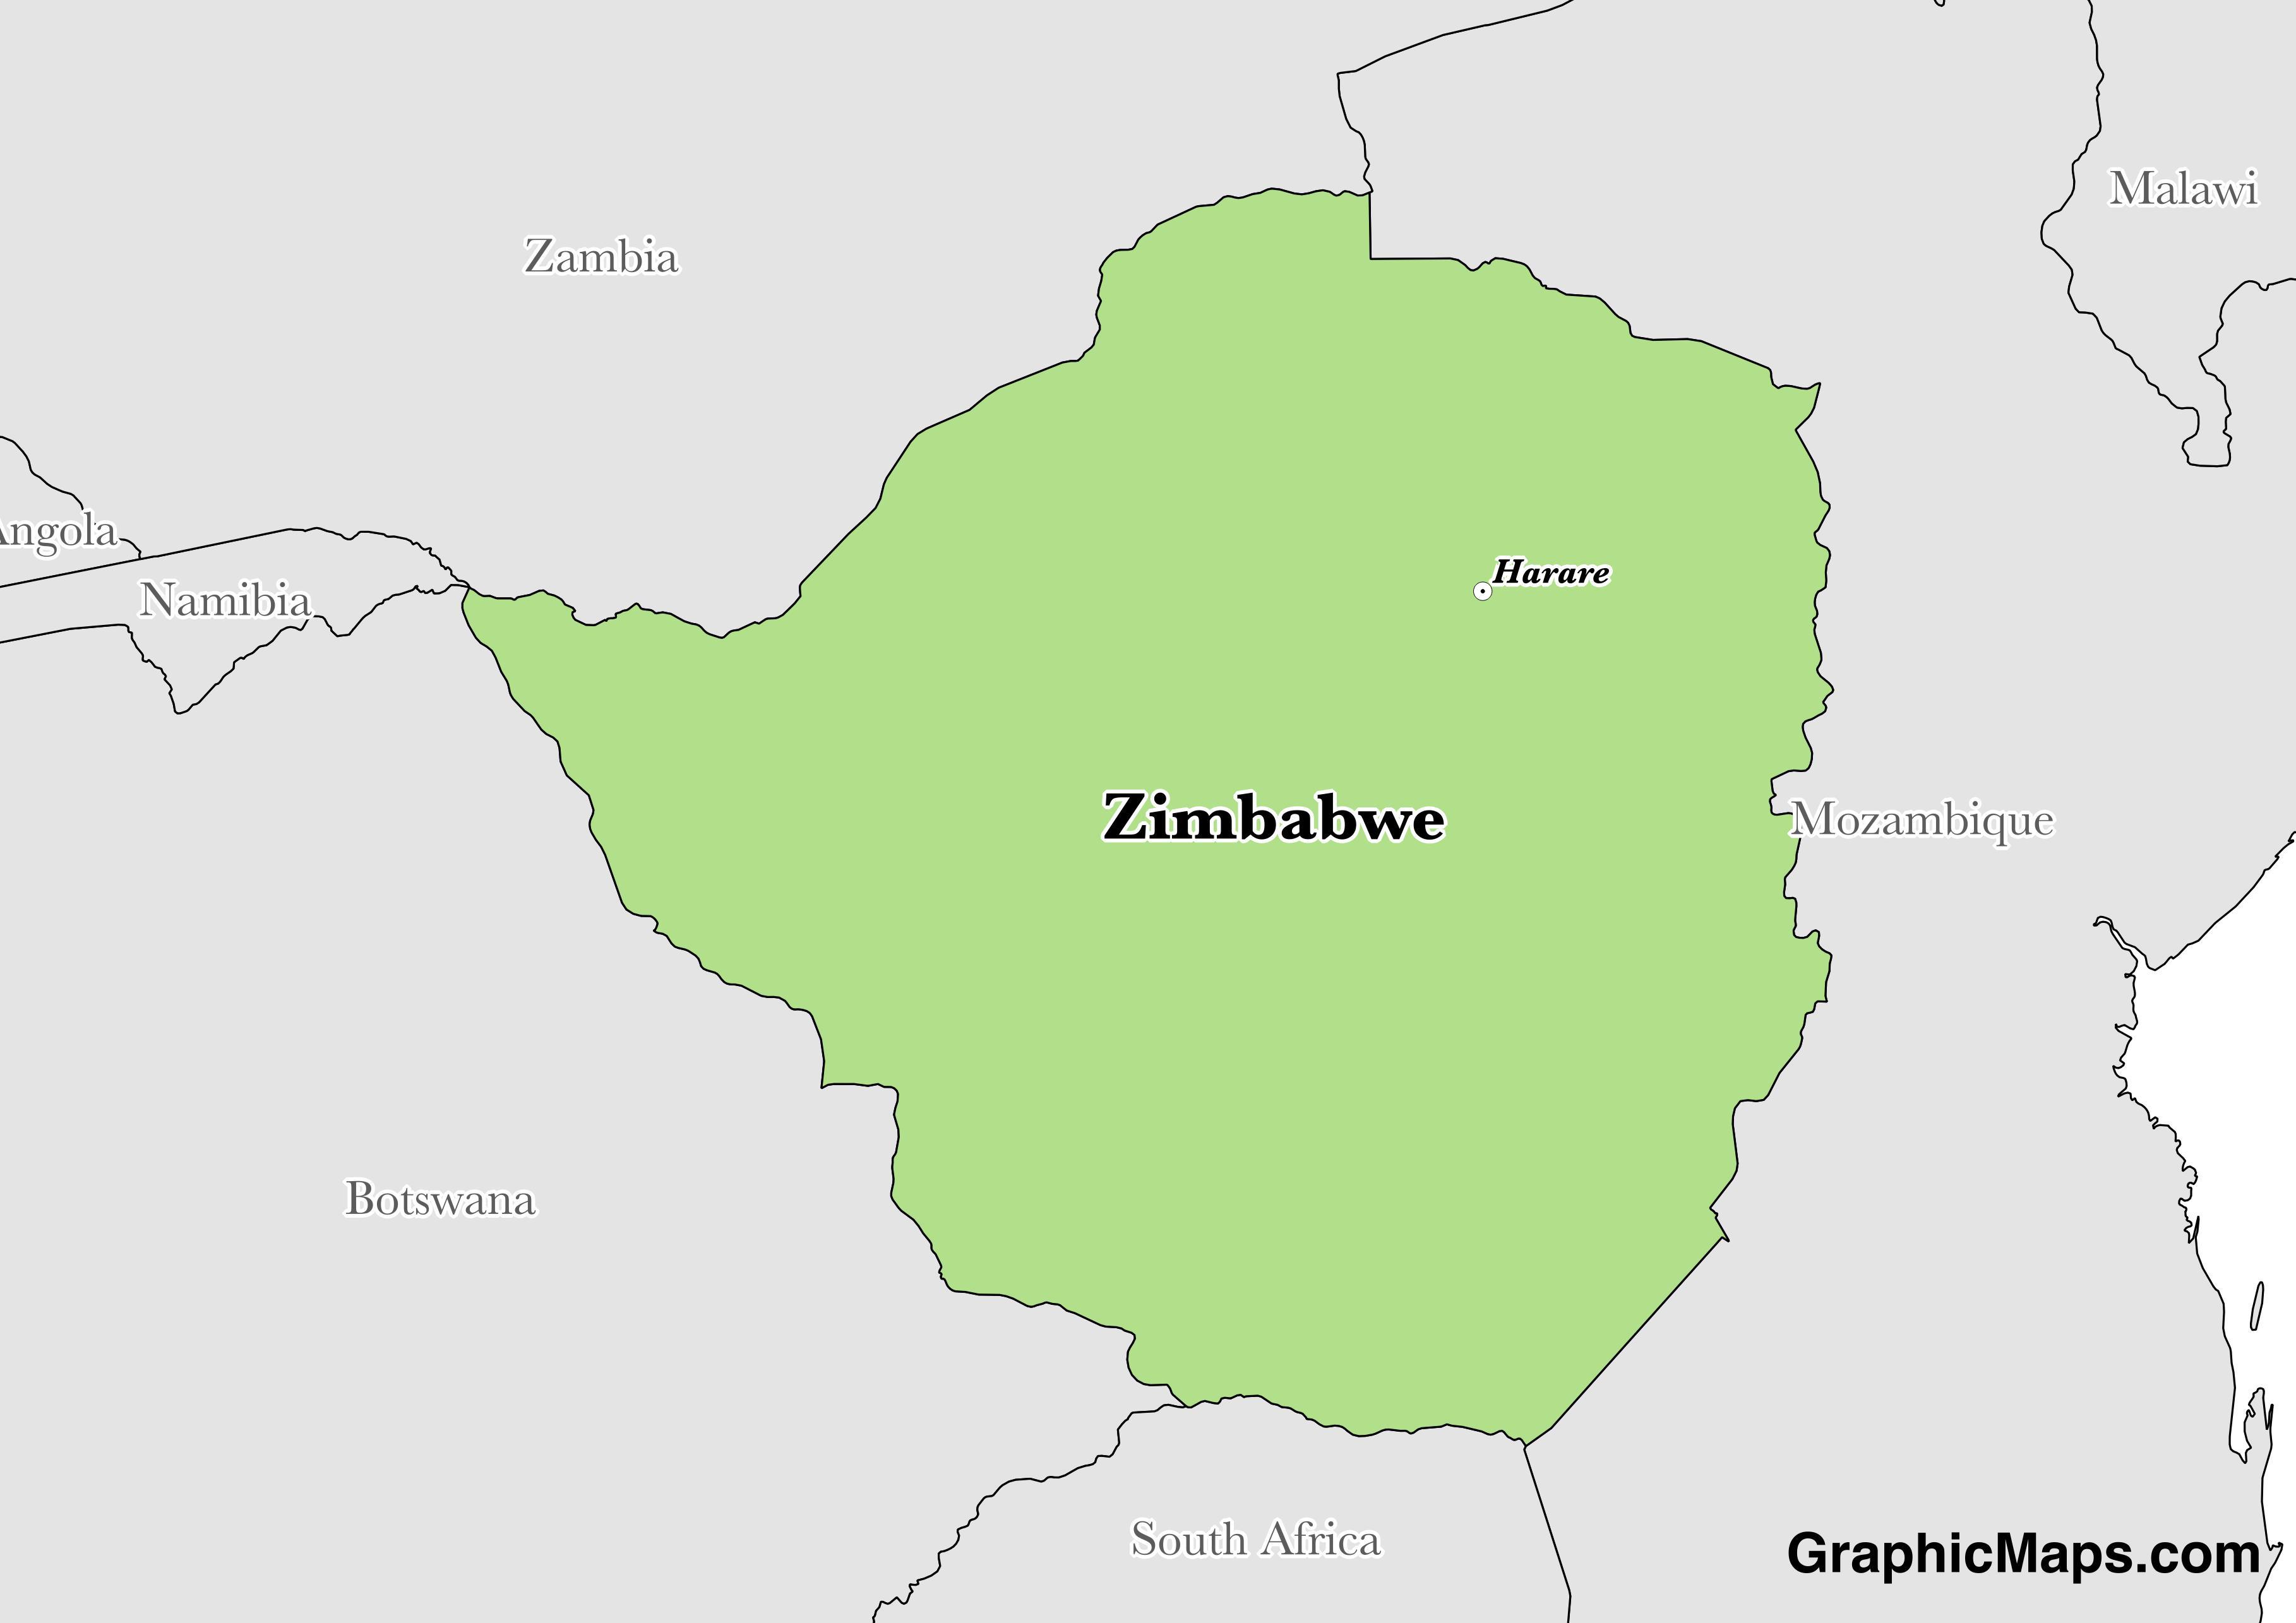 Map showing the location of Zimbabwe